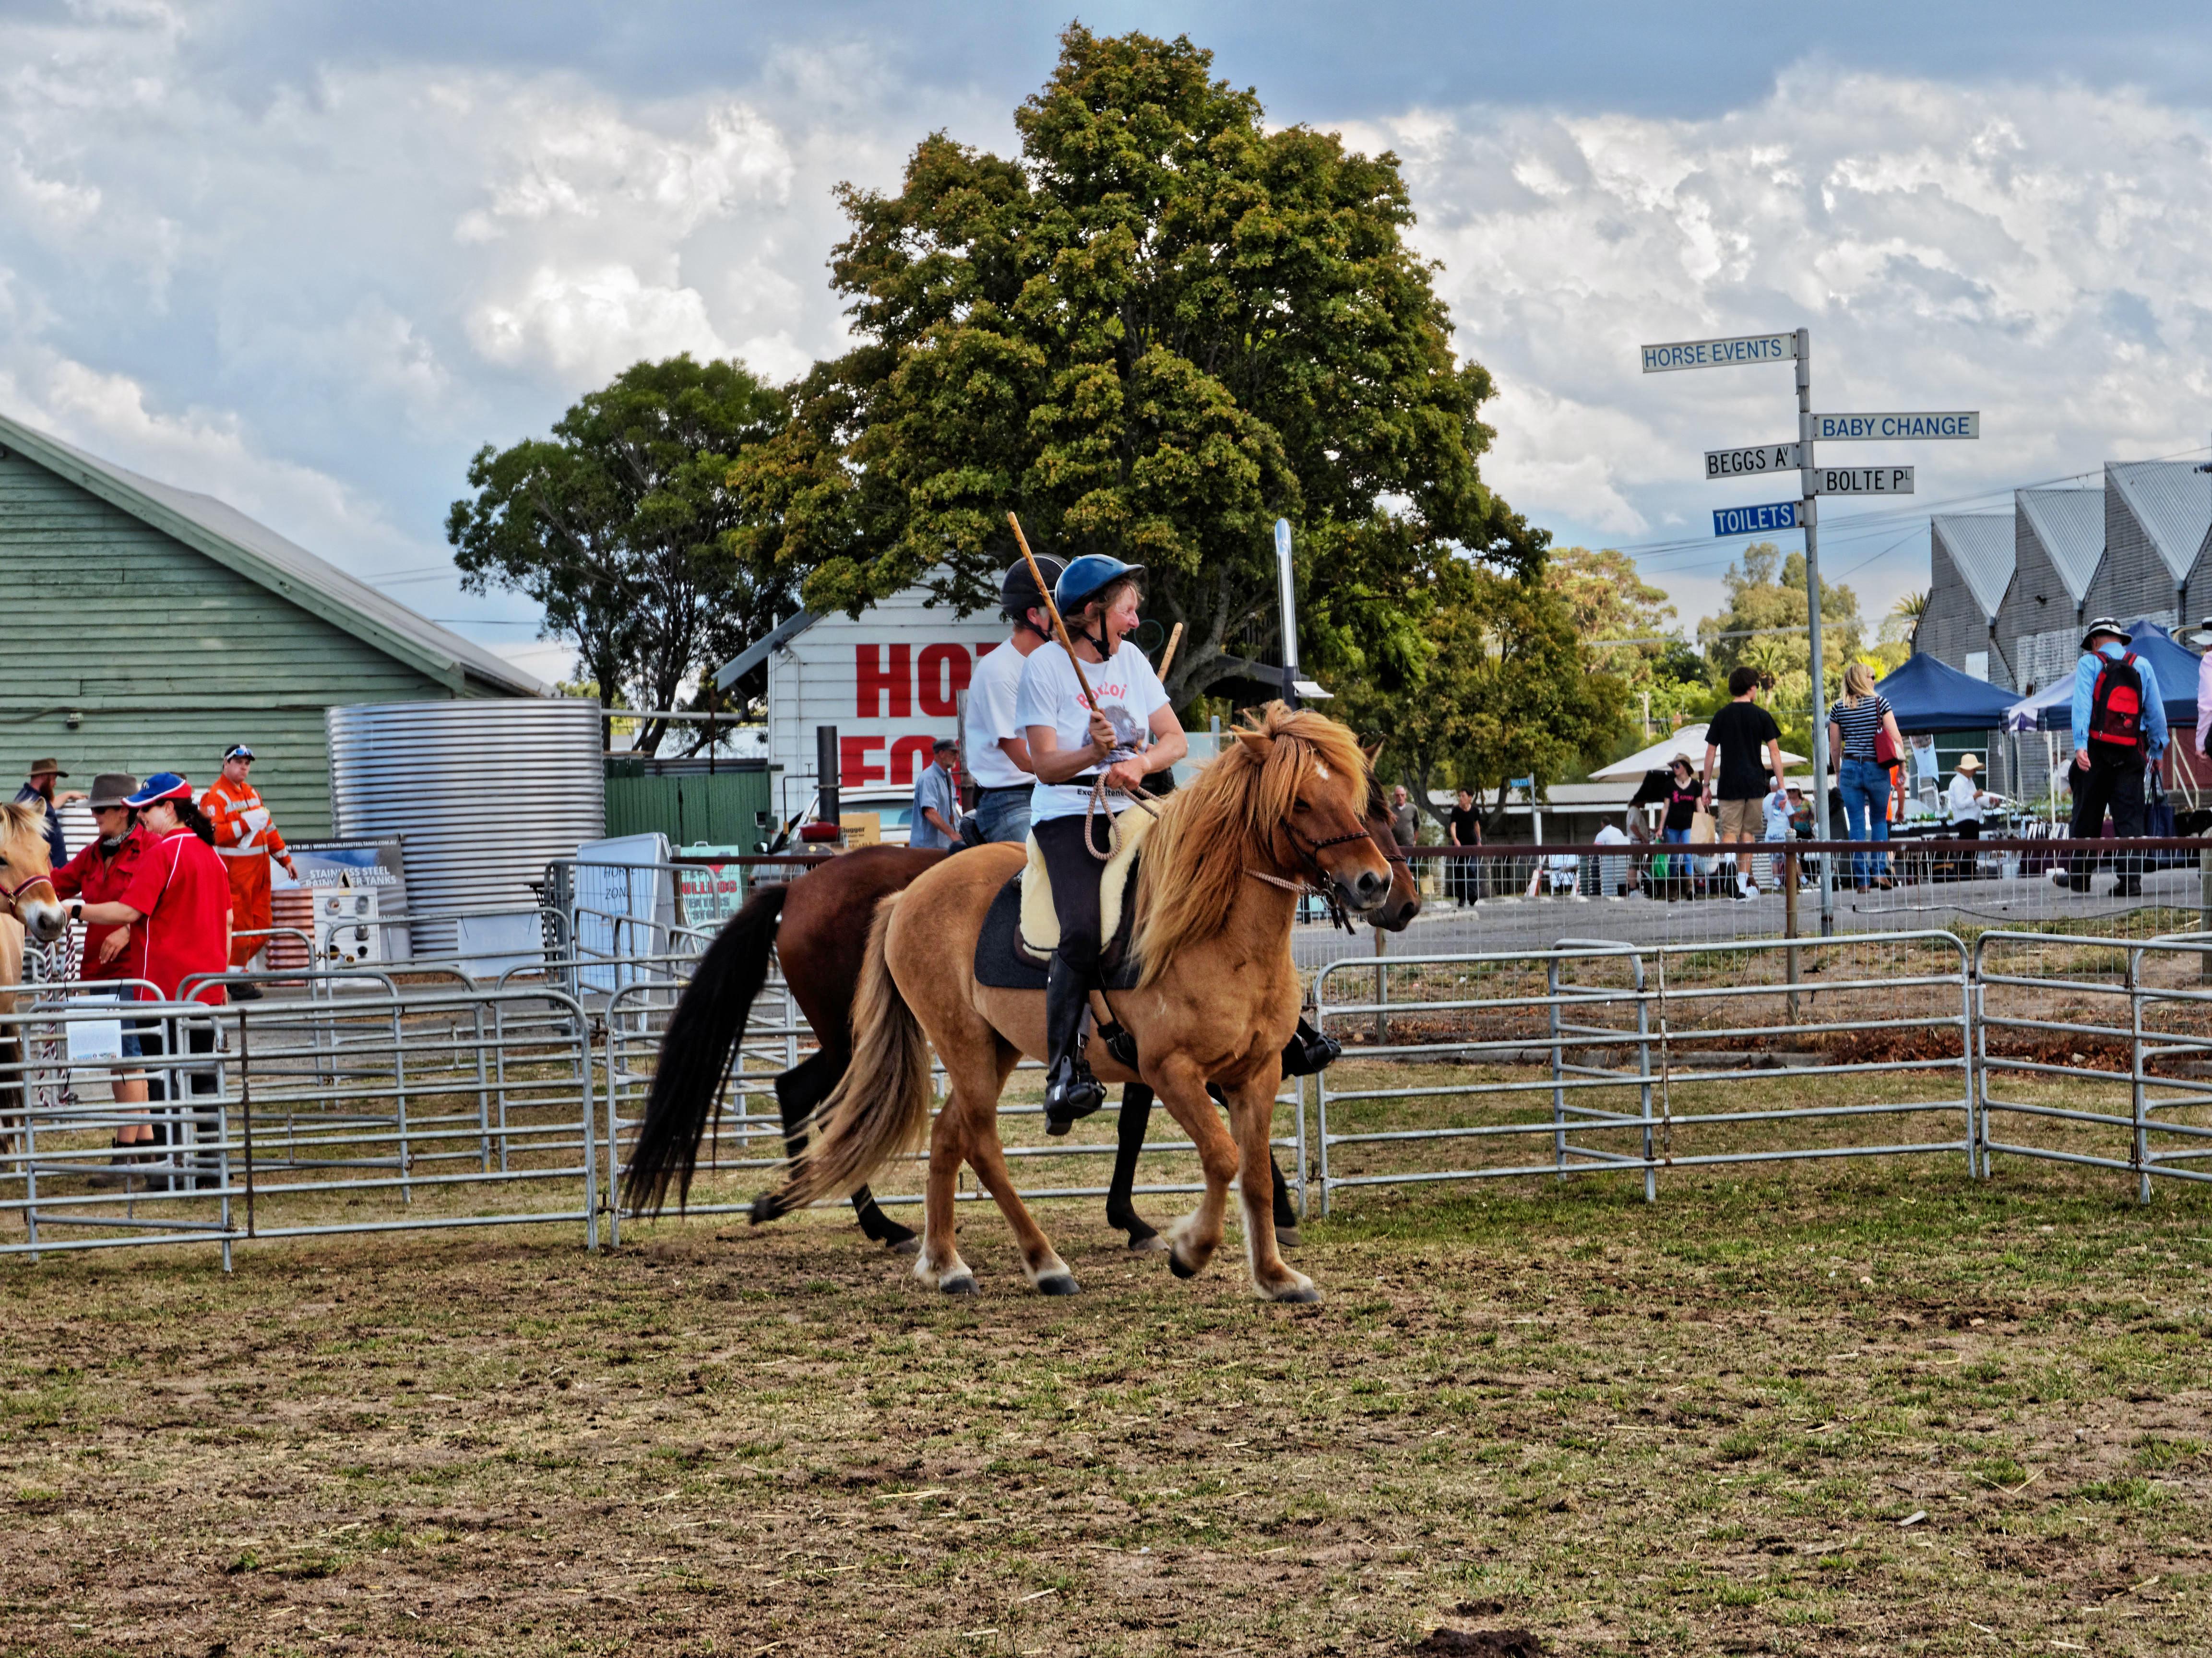 Rural-lifestyle-expo-140.jpeg